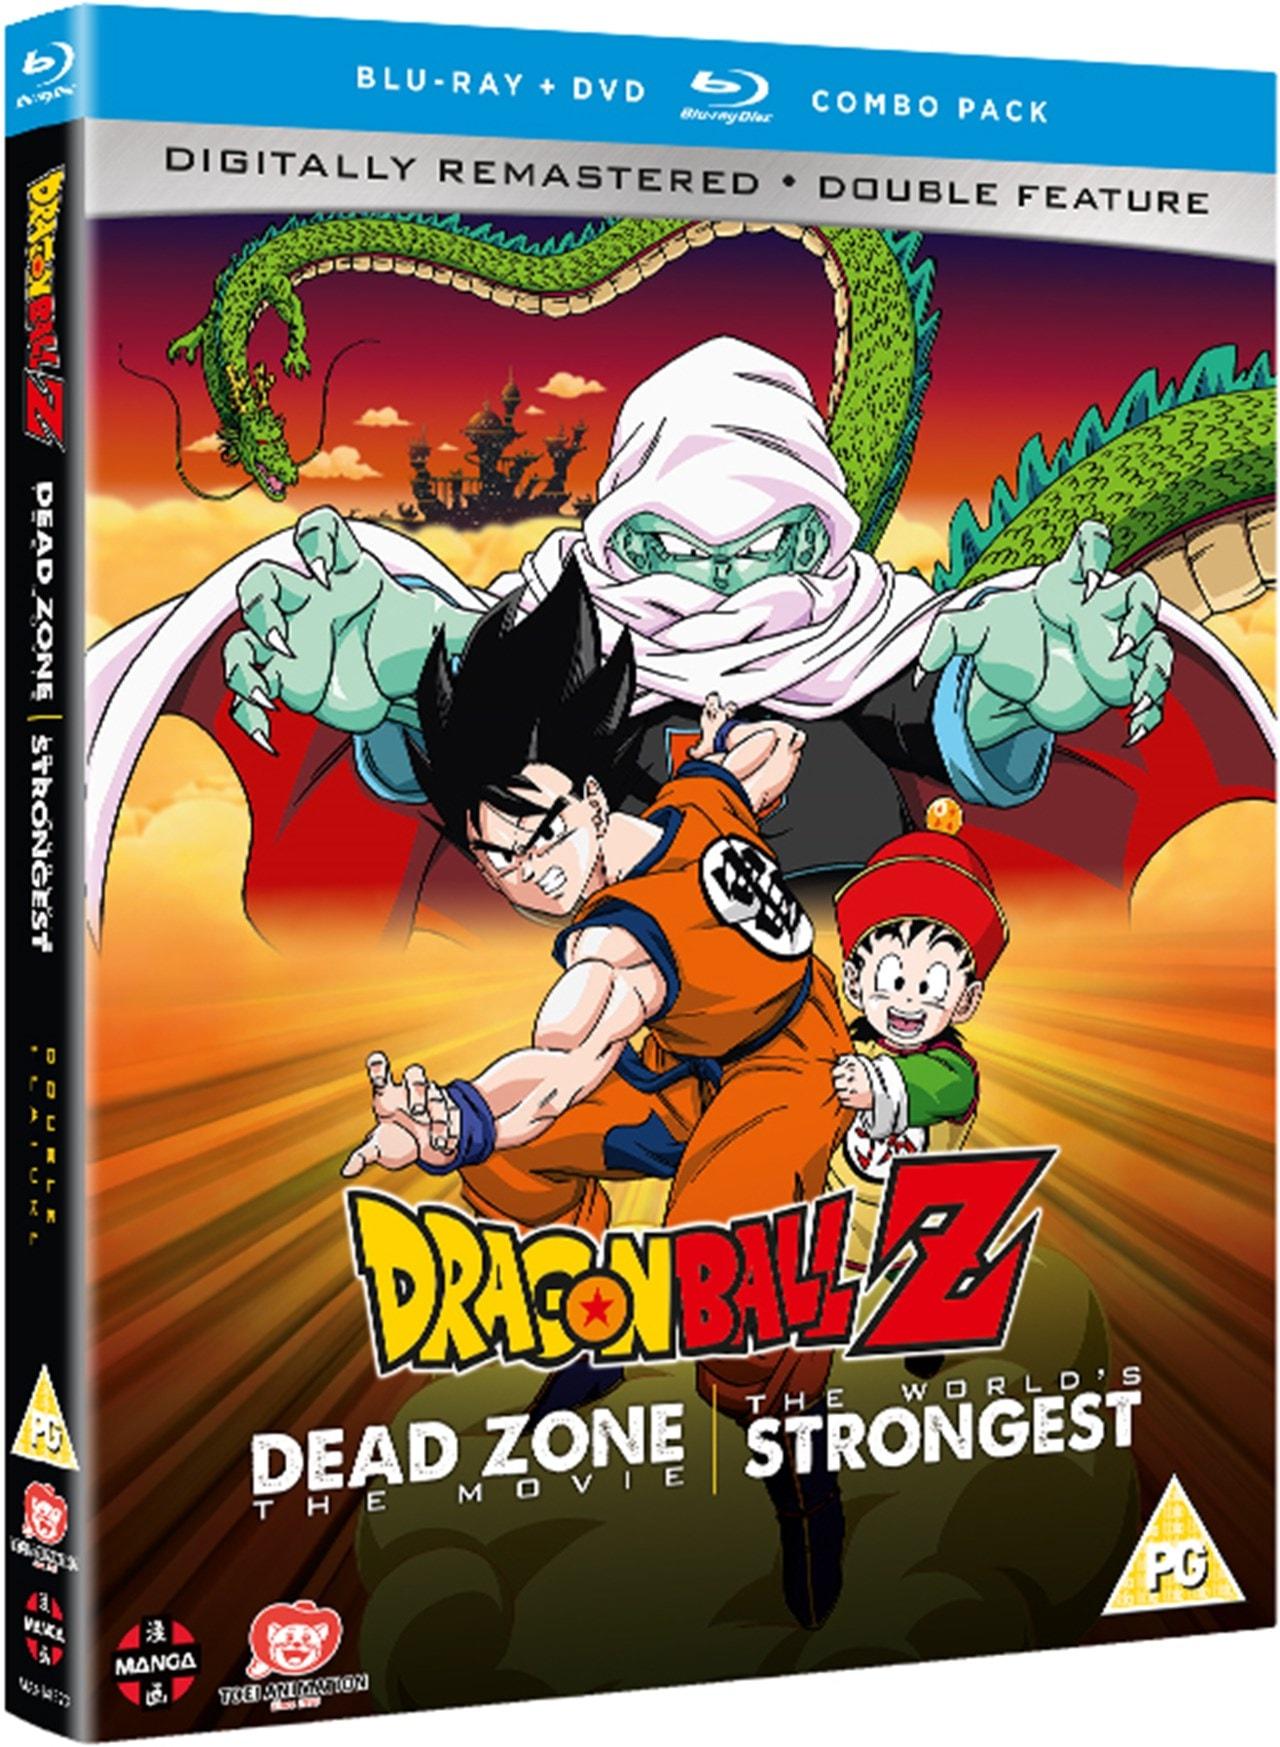 Dragonball Z: Dead Zone/The World's Strongest - 2